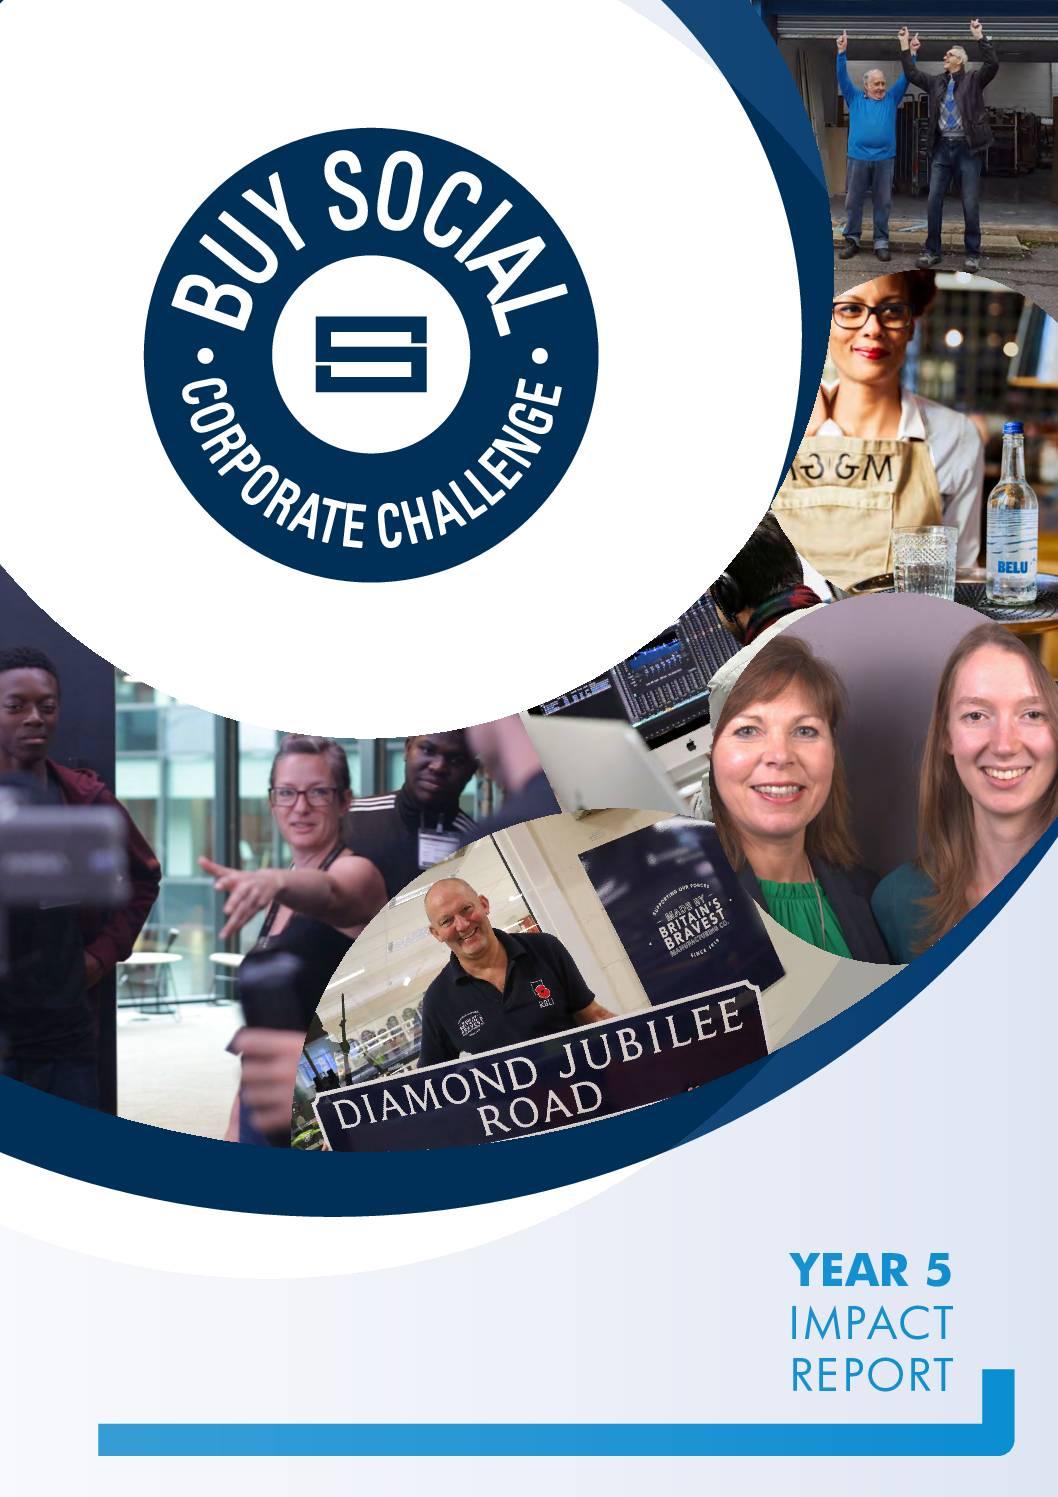 SEUK – Buy Social Corporate Challenge – Year 5 Impact  Report